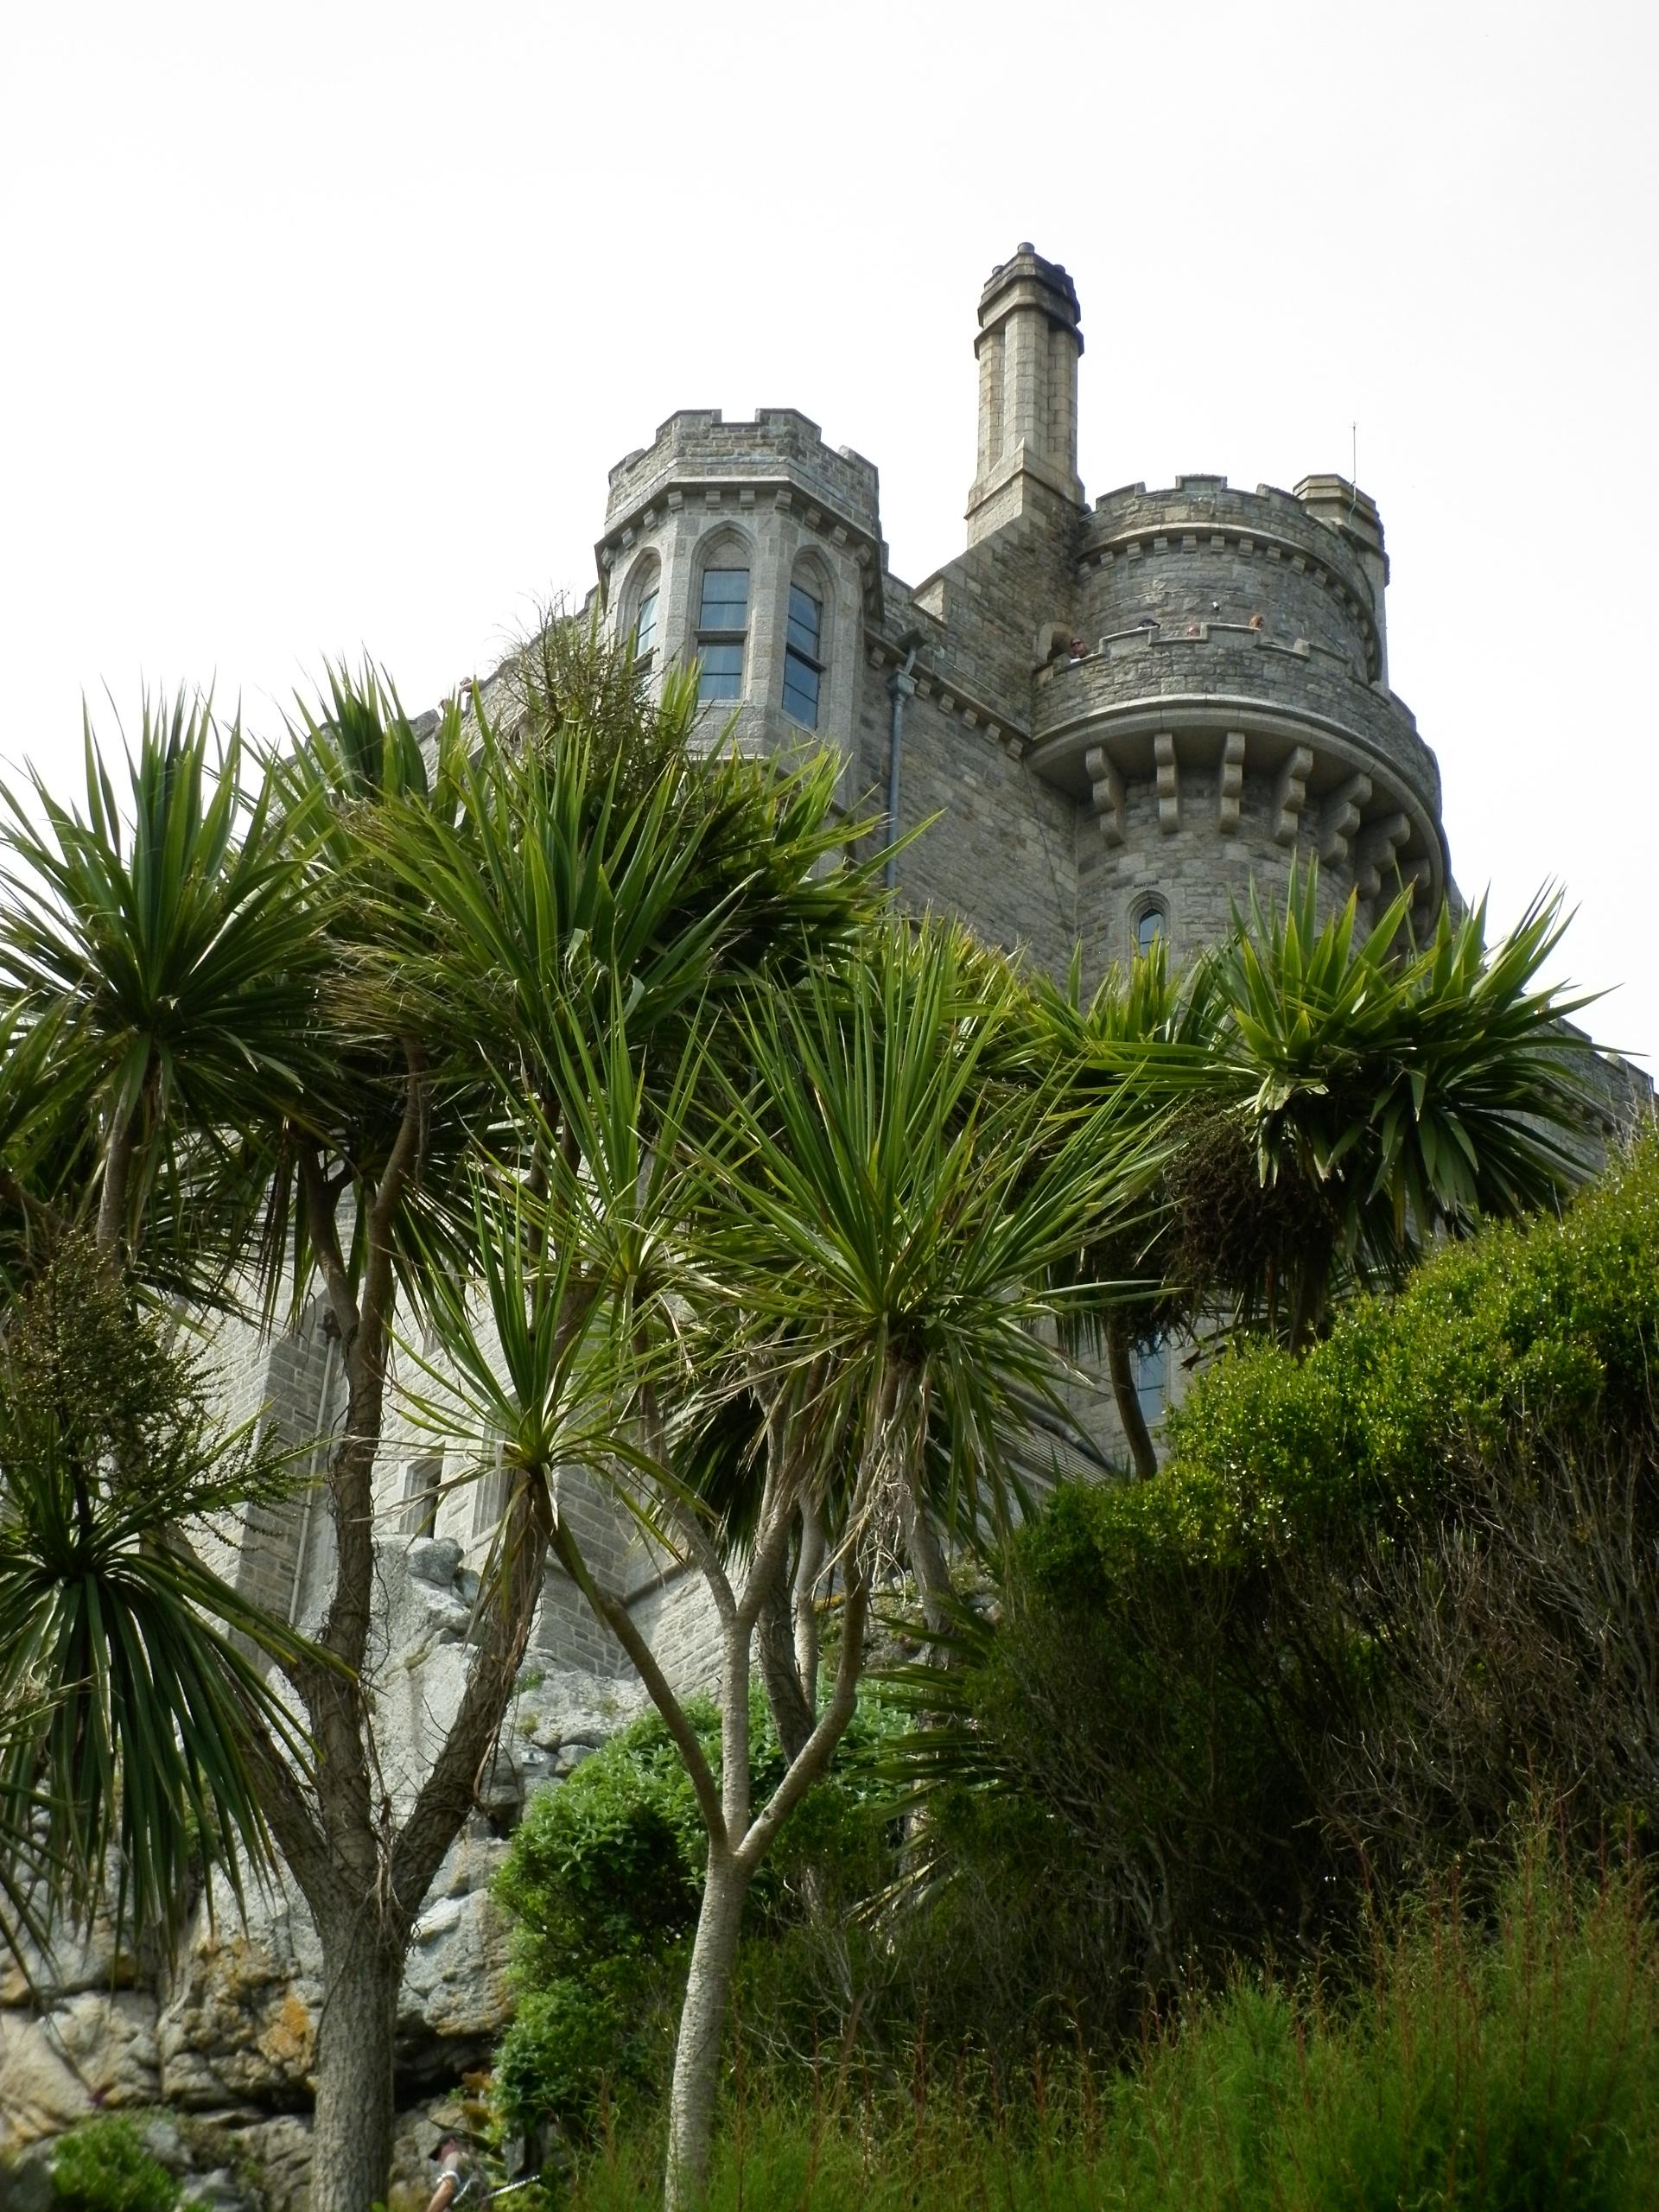 The castle in St Michael's Mount